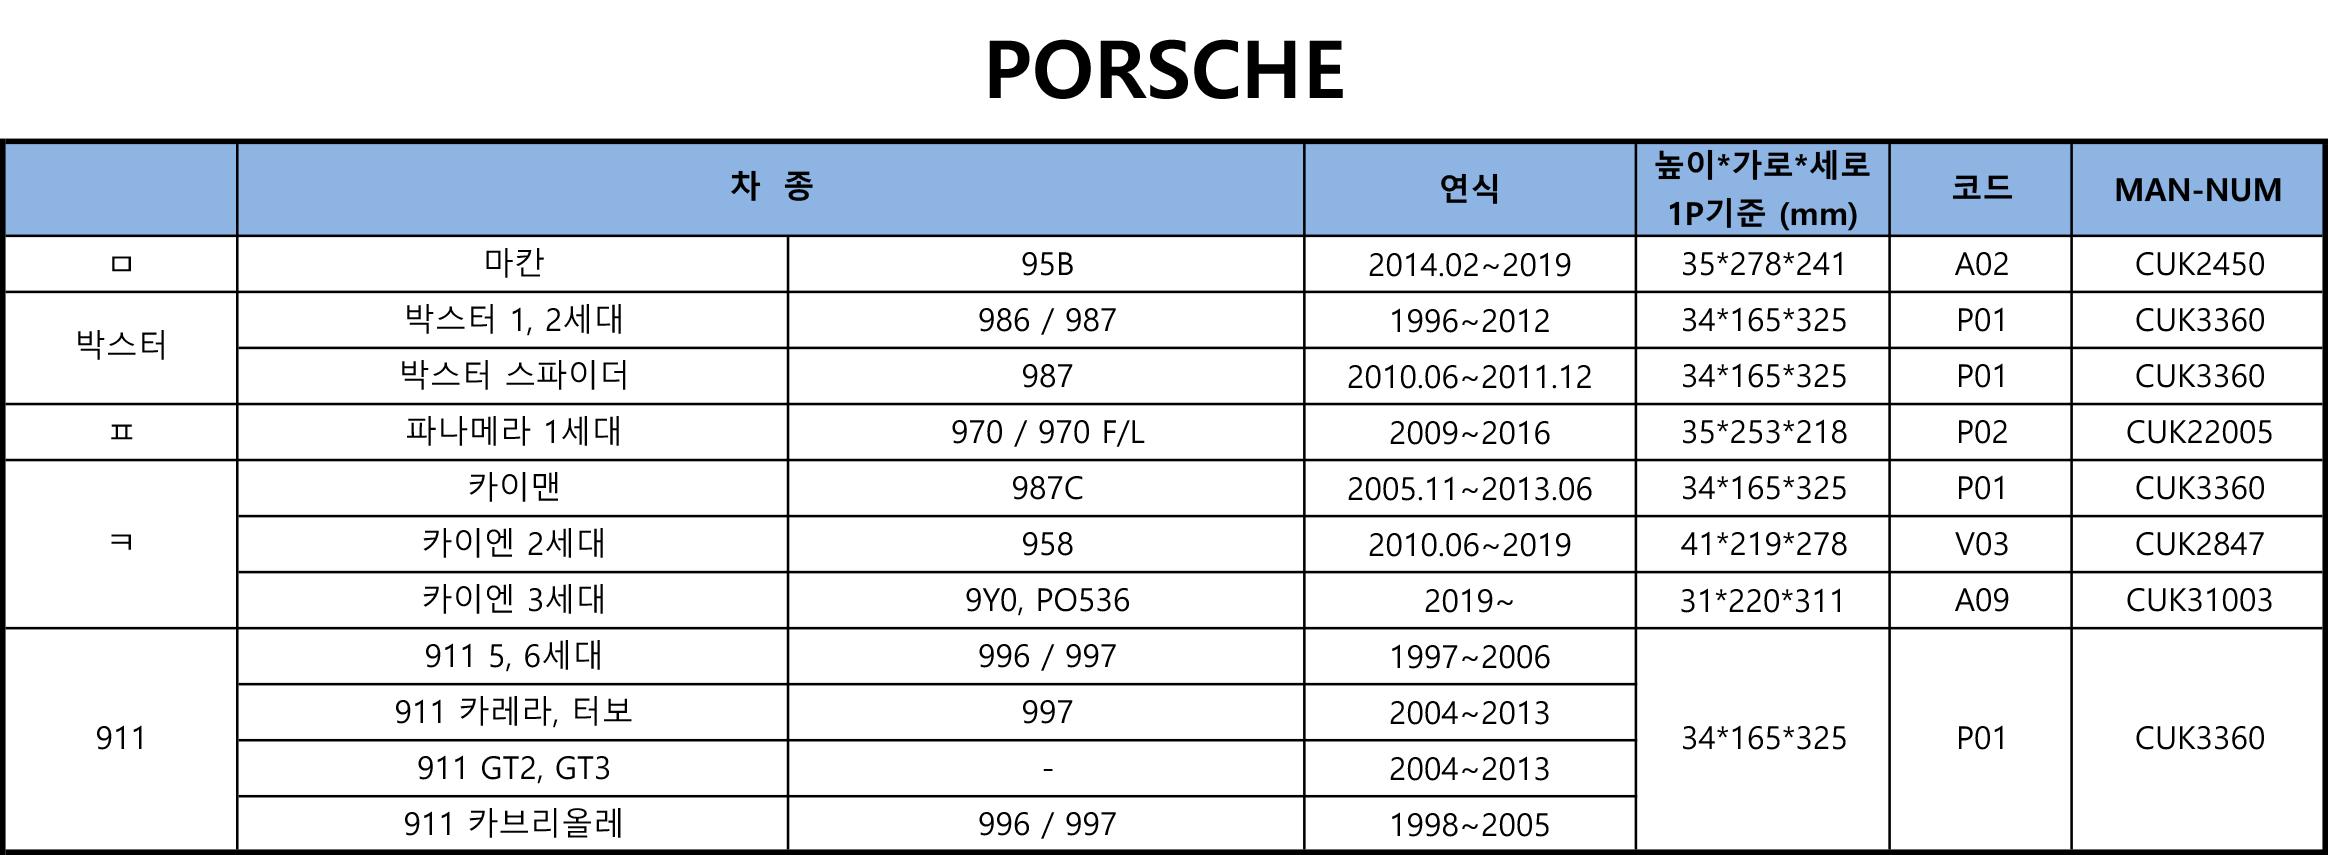 8-PORSHE.png